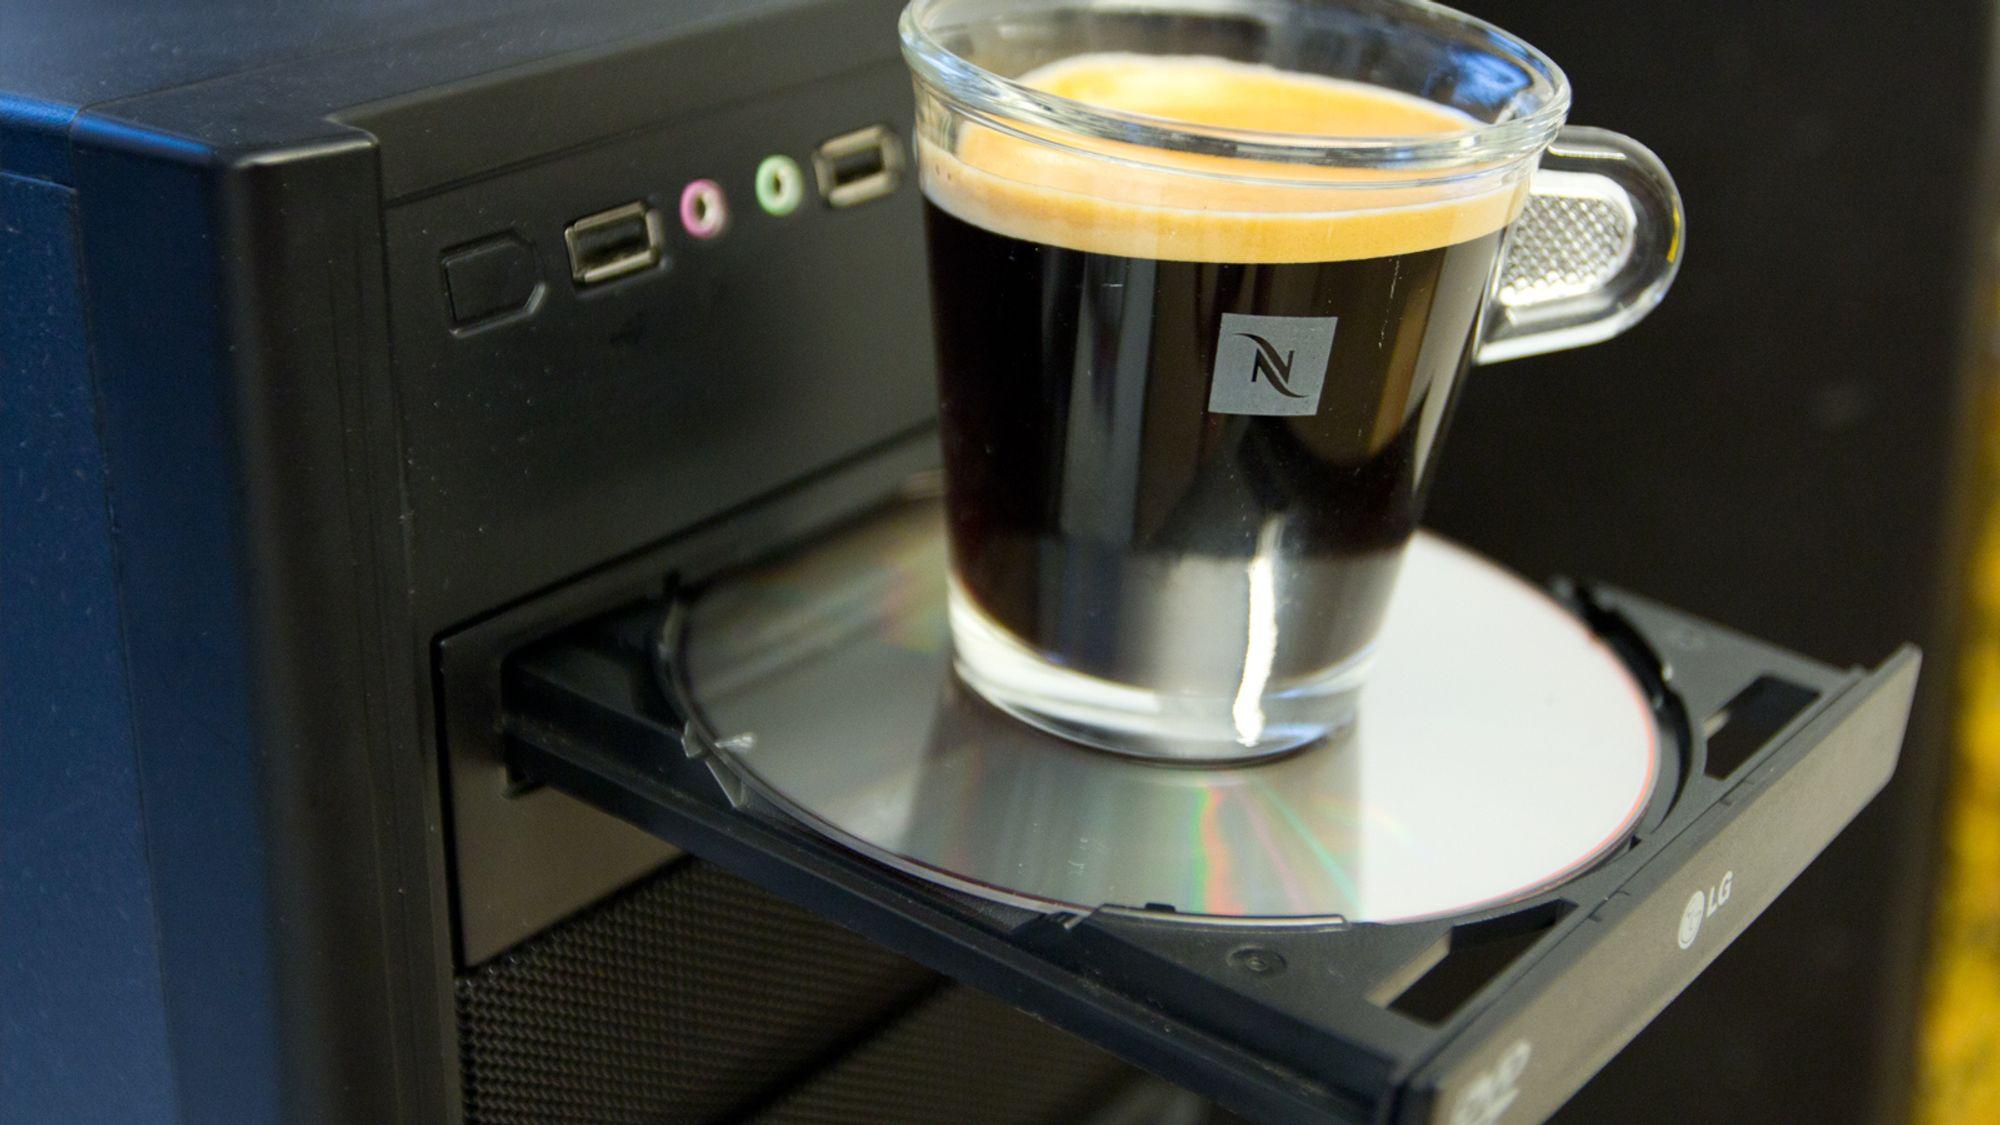 Les Hvor mange kaffekopper tror du den bærer?